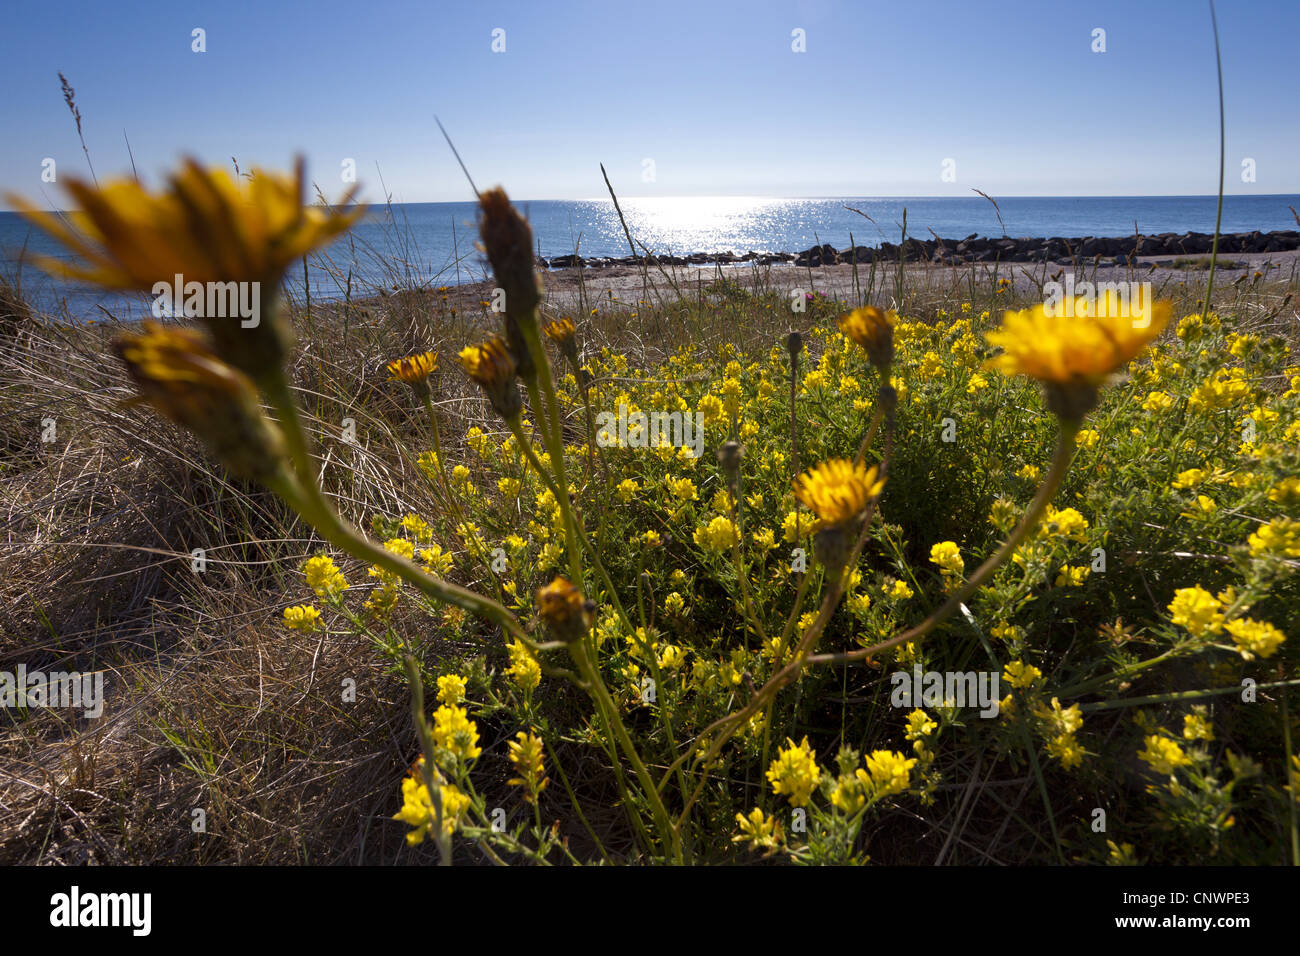 Yellow flowered alfalfa medicago falcata stock photos yellow sickle alfalfa sickle medick yellow lucerne yellow flowered alfalfa medicago falcata mightylinksfo